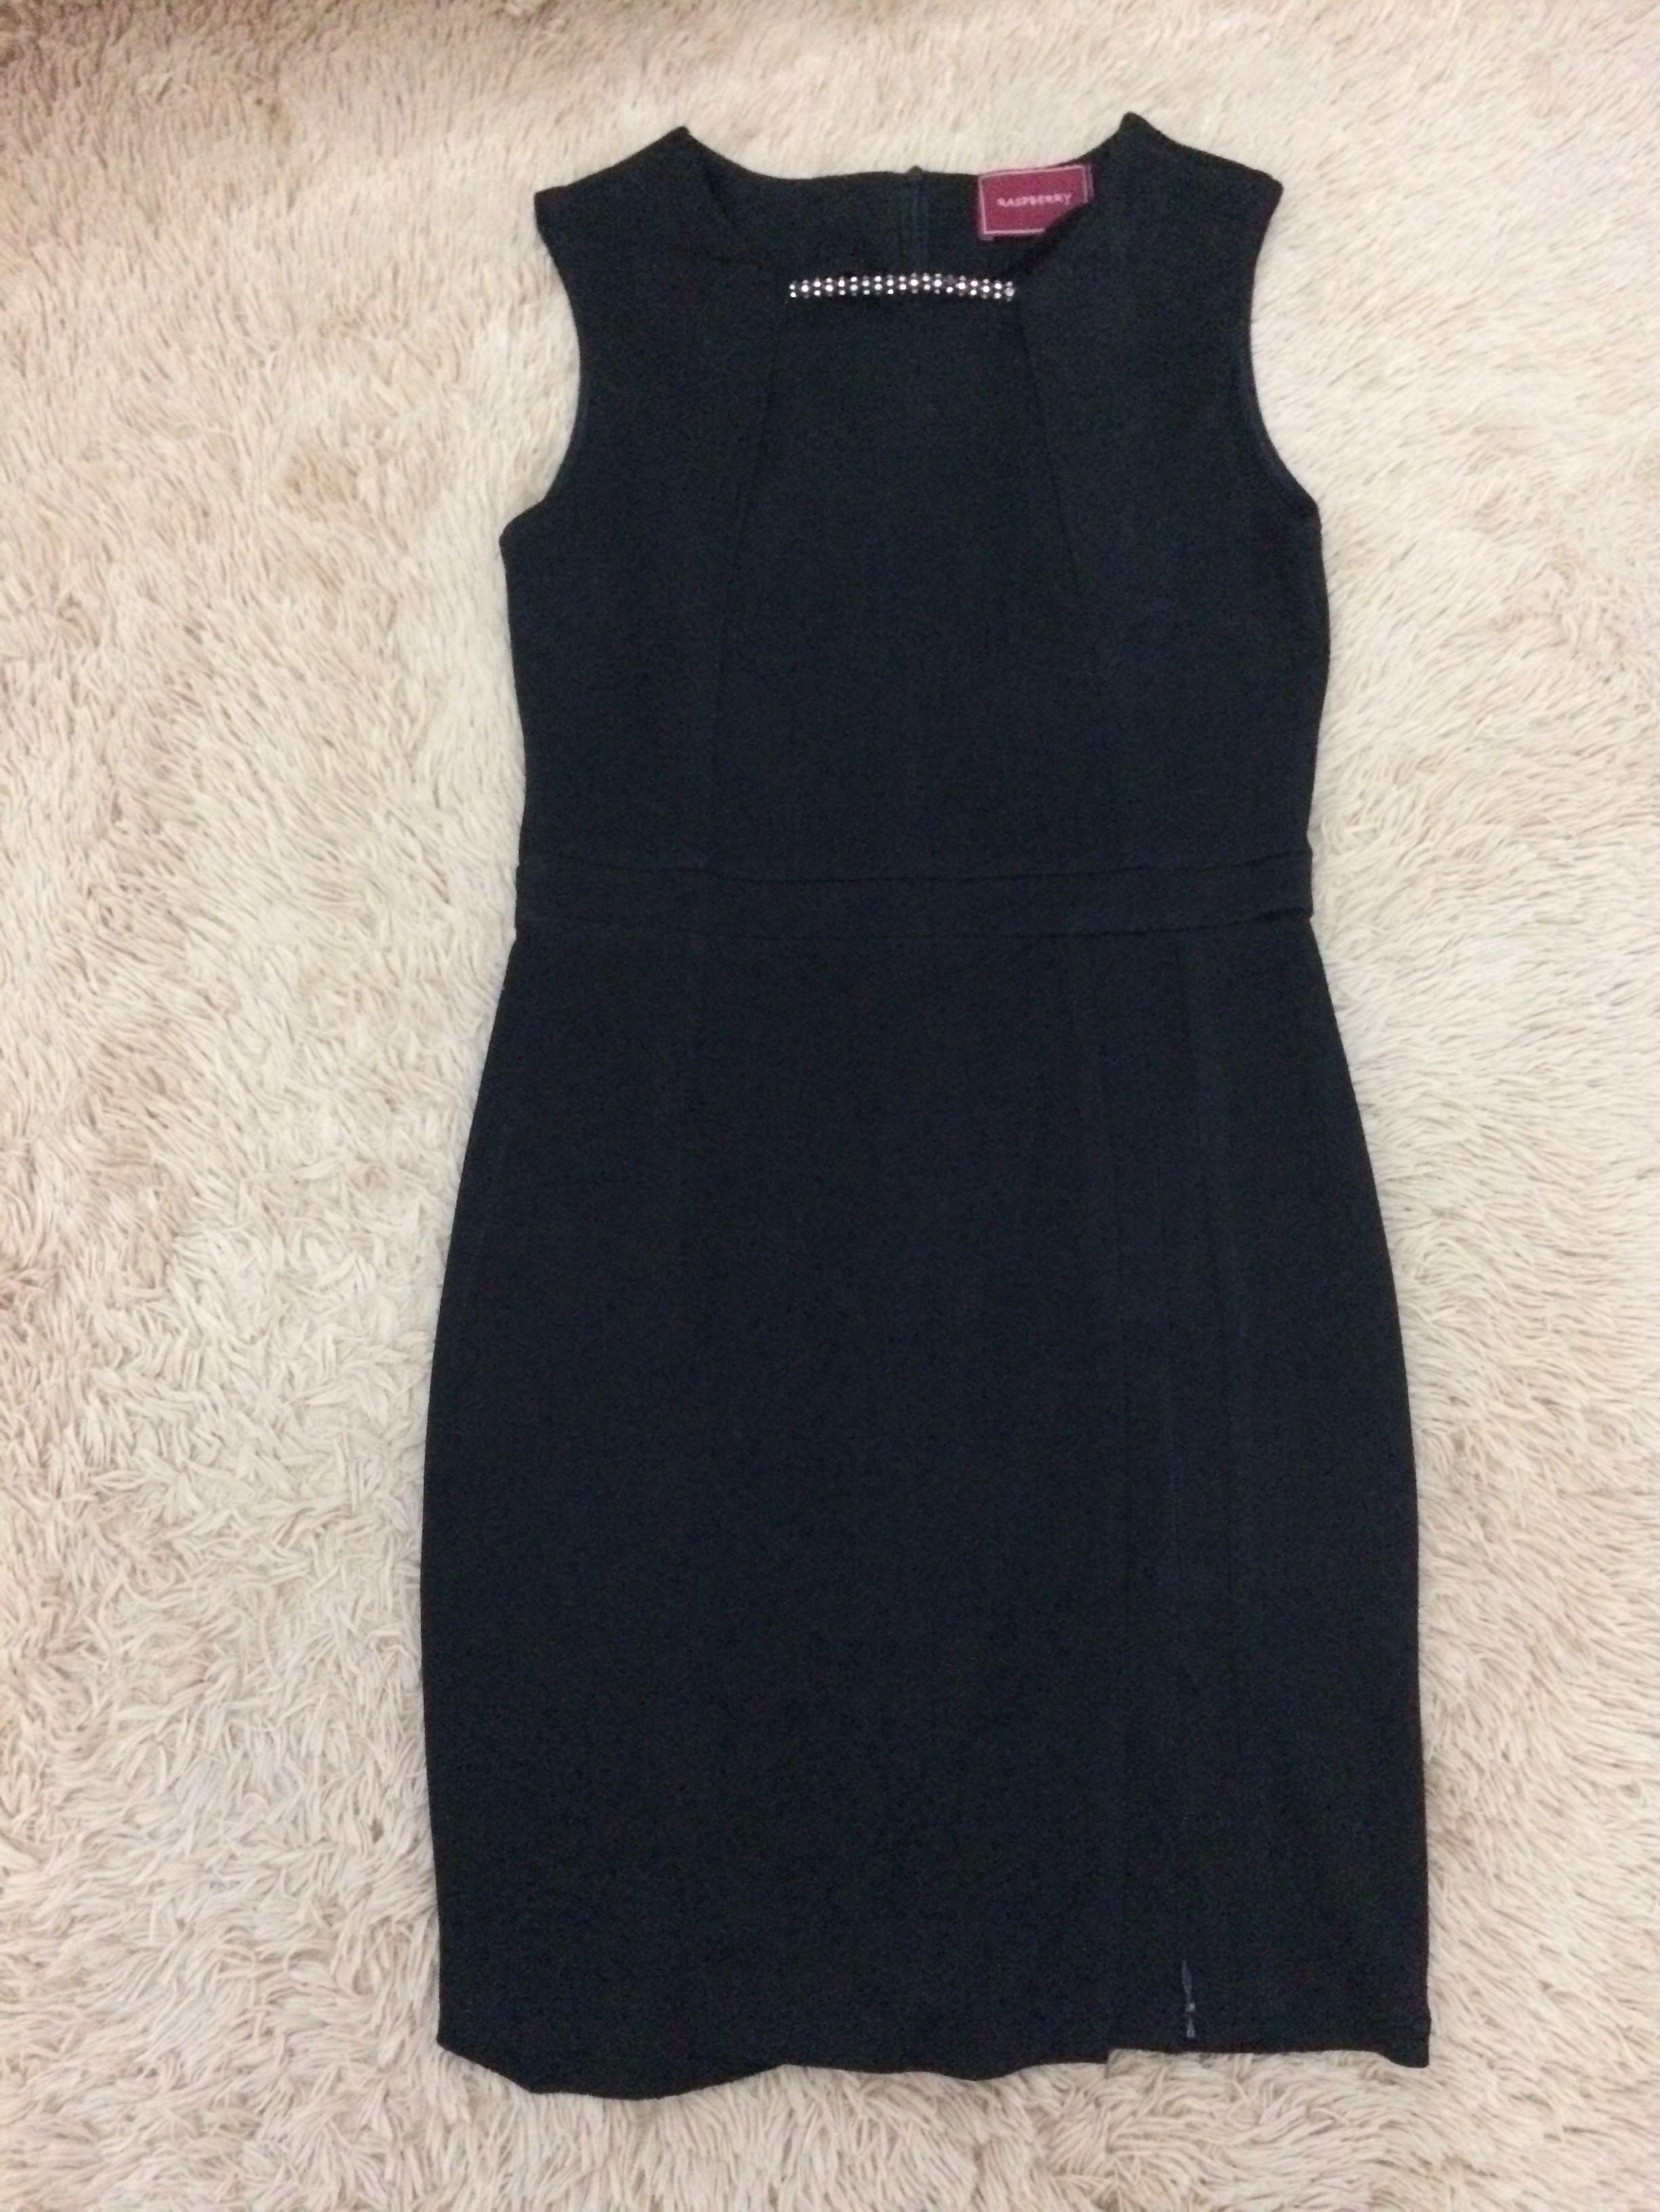 Black dress by raspberry